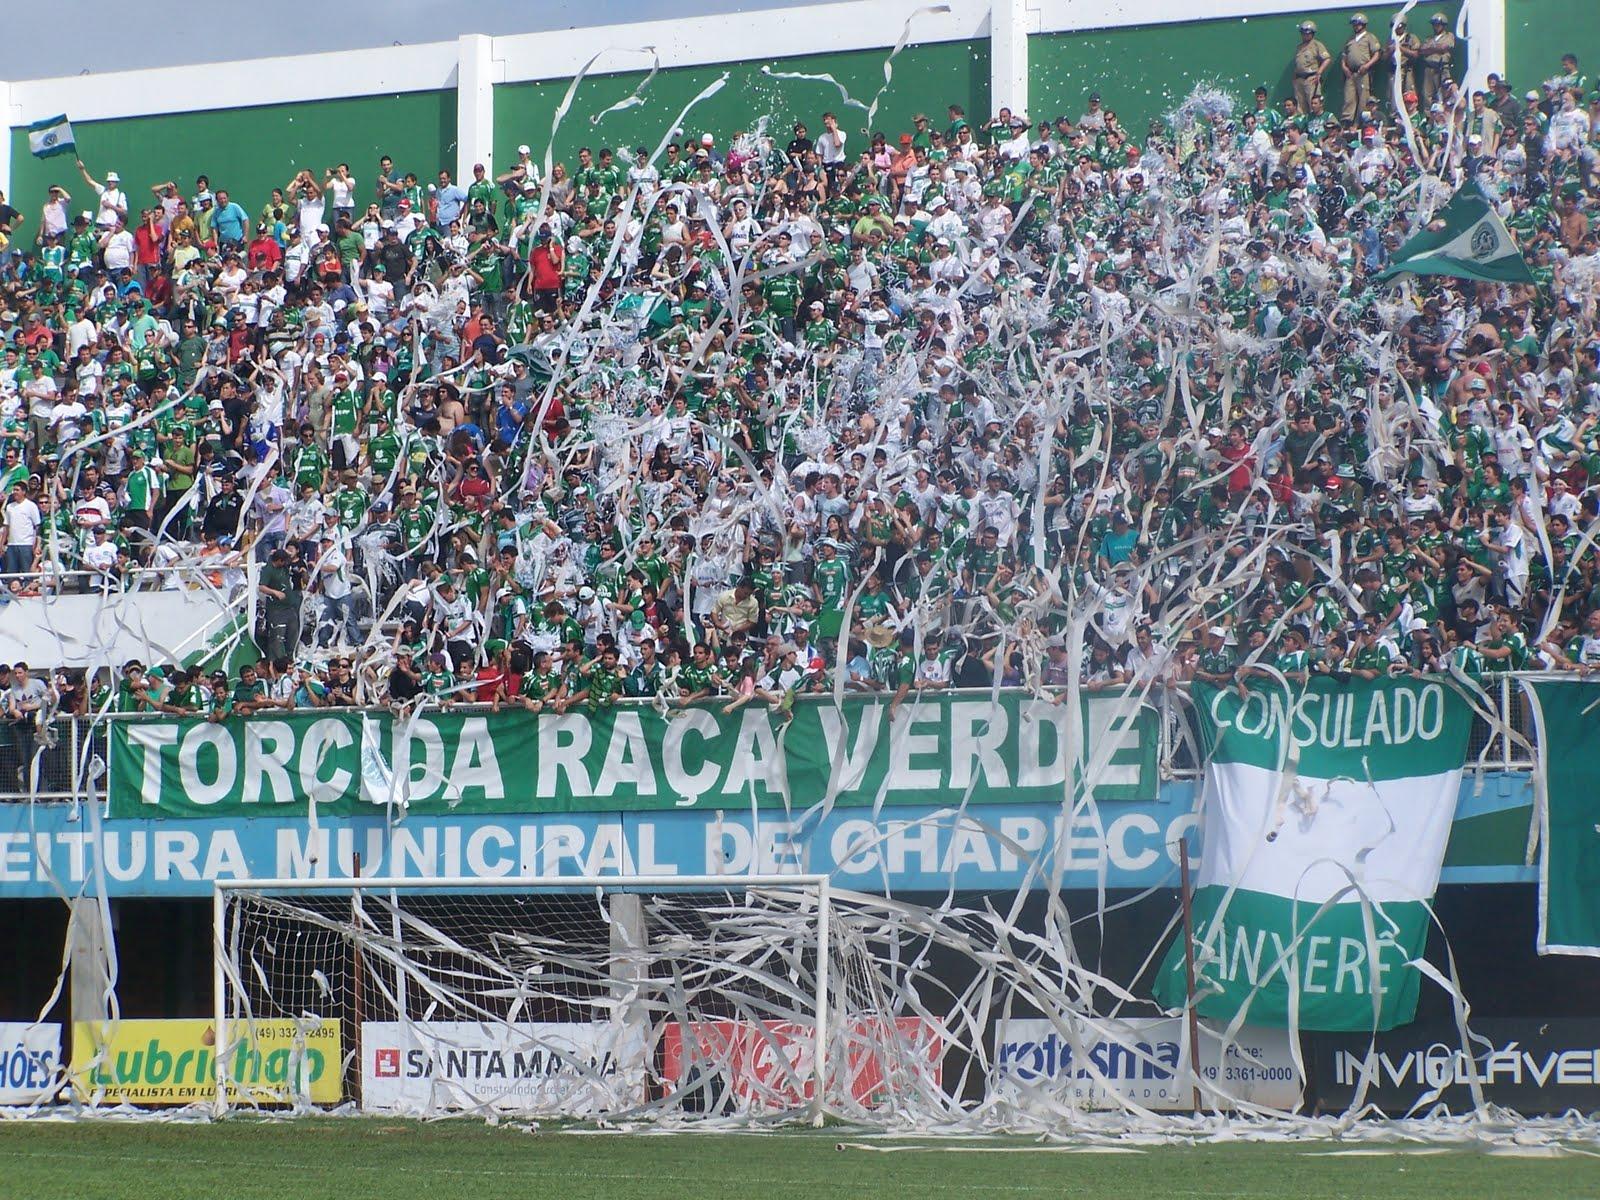 Campeonato Catarinense mercoledì 23 gennaio